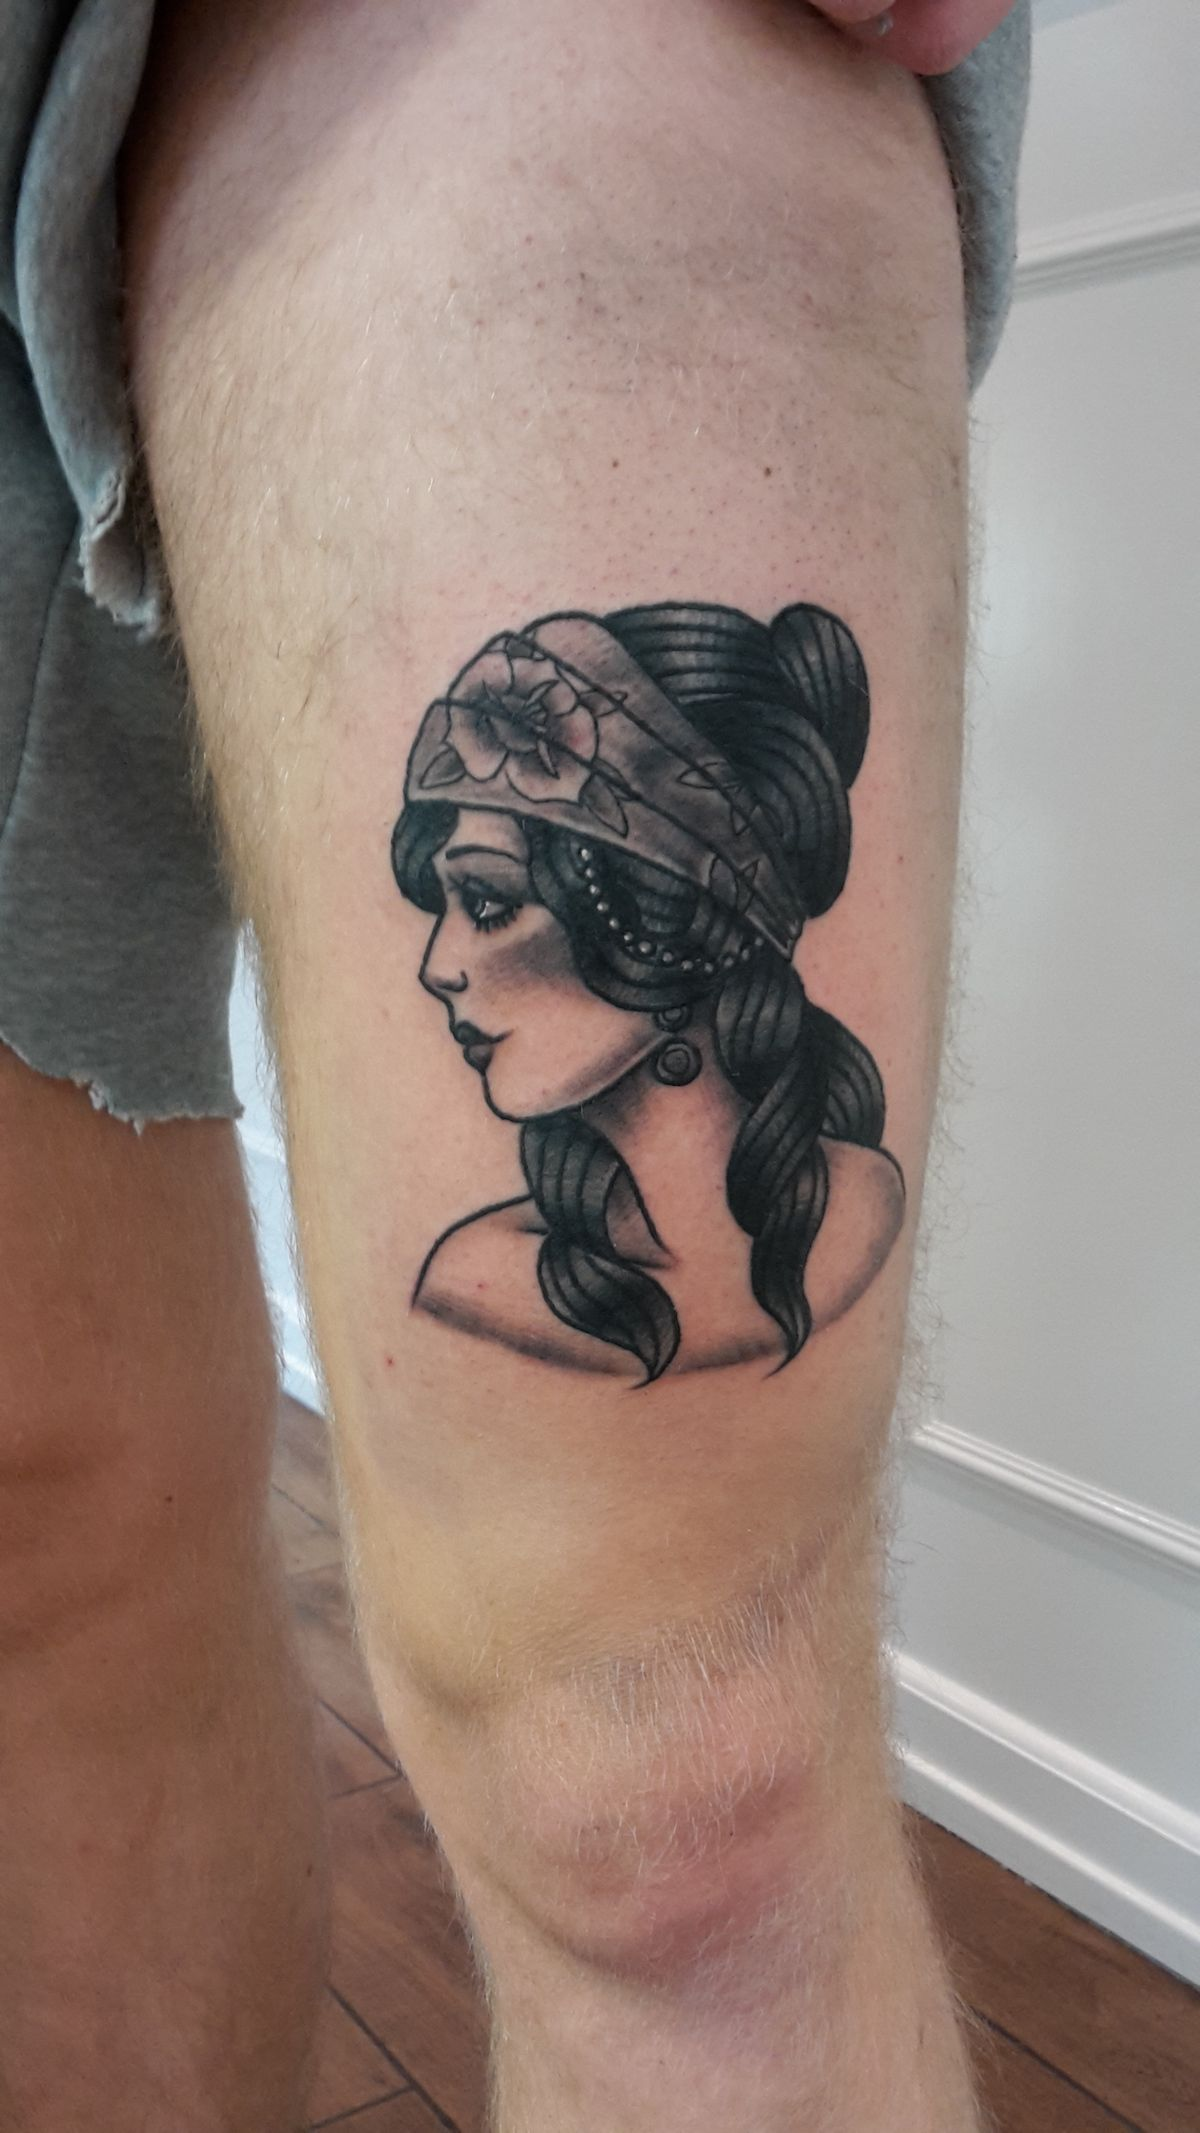 Art Of Ink Århus tattoo #tattoos #aarhus #color #sinnersinc #art #artwork #artist